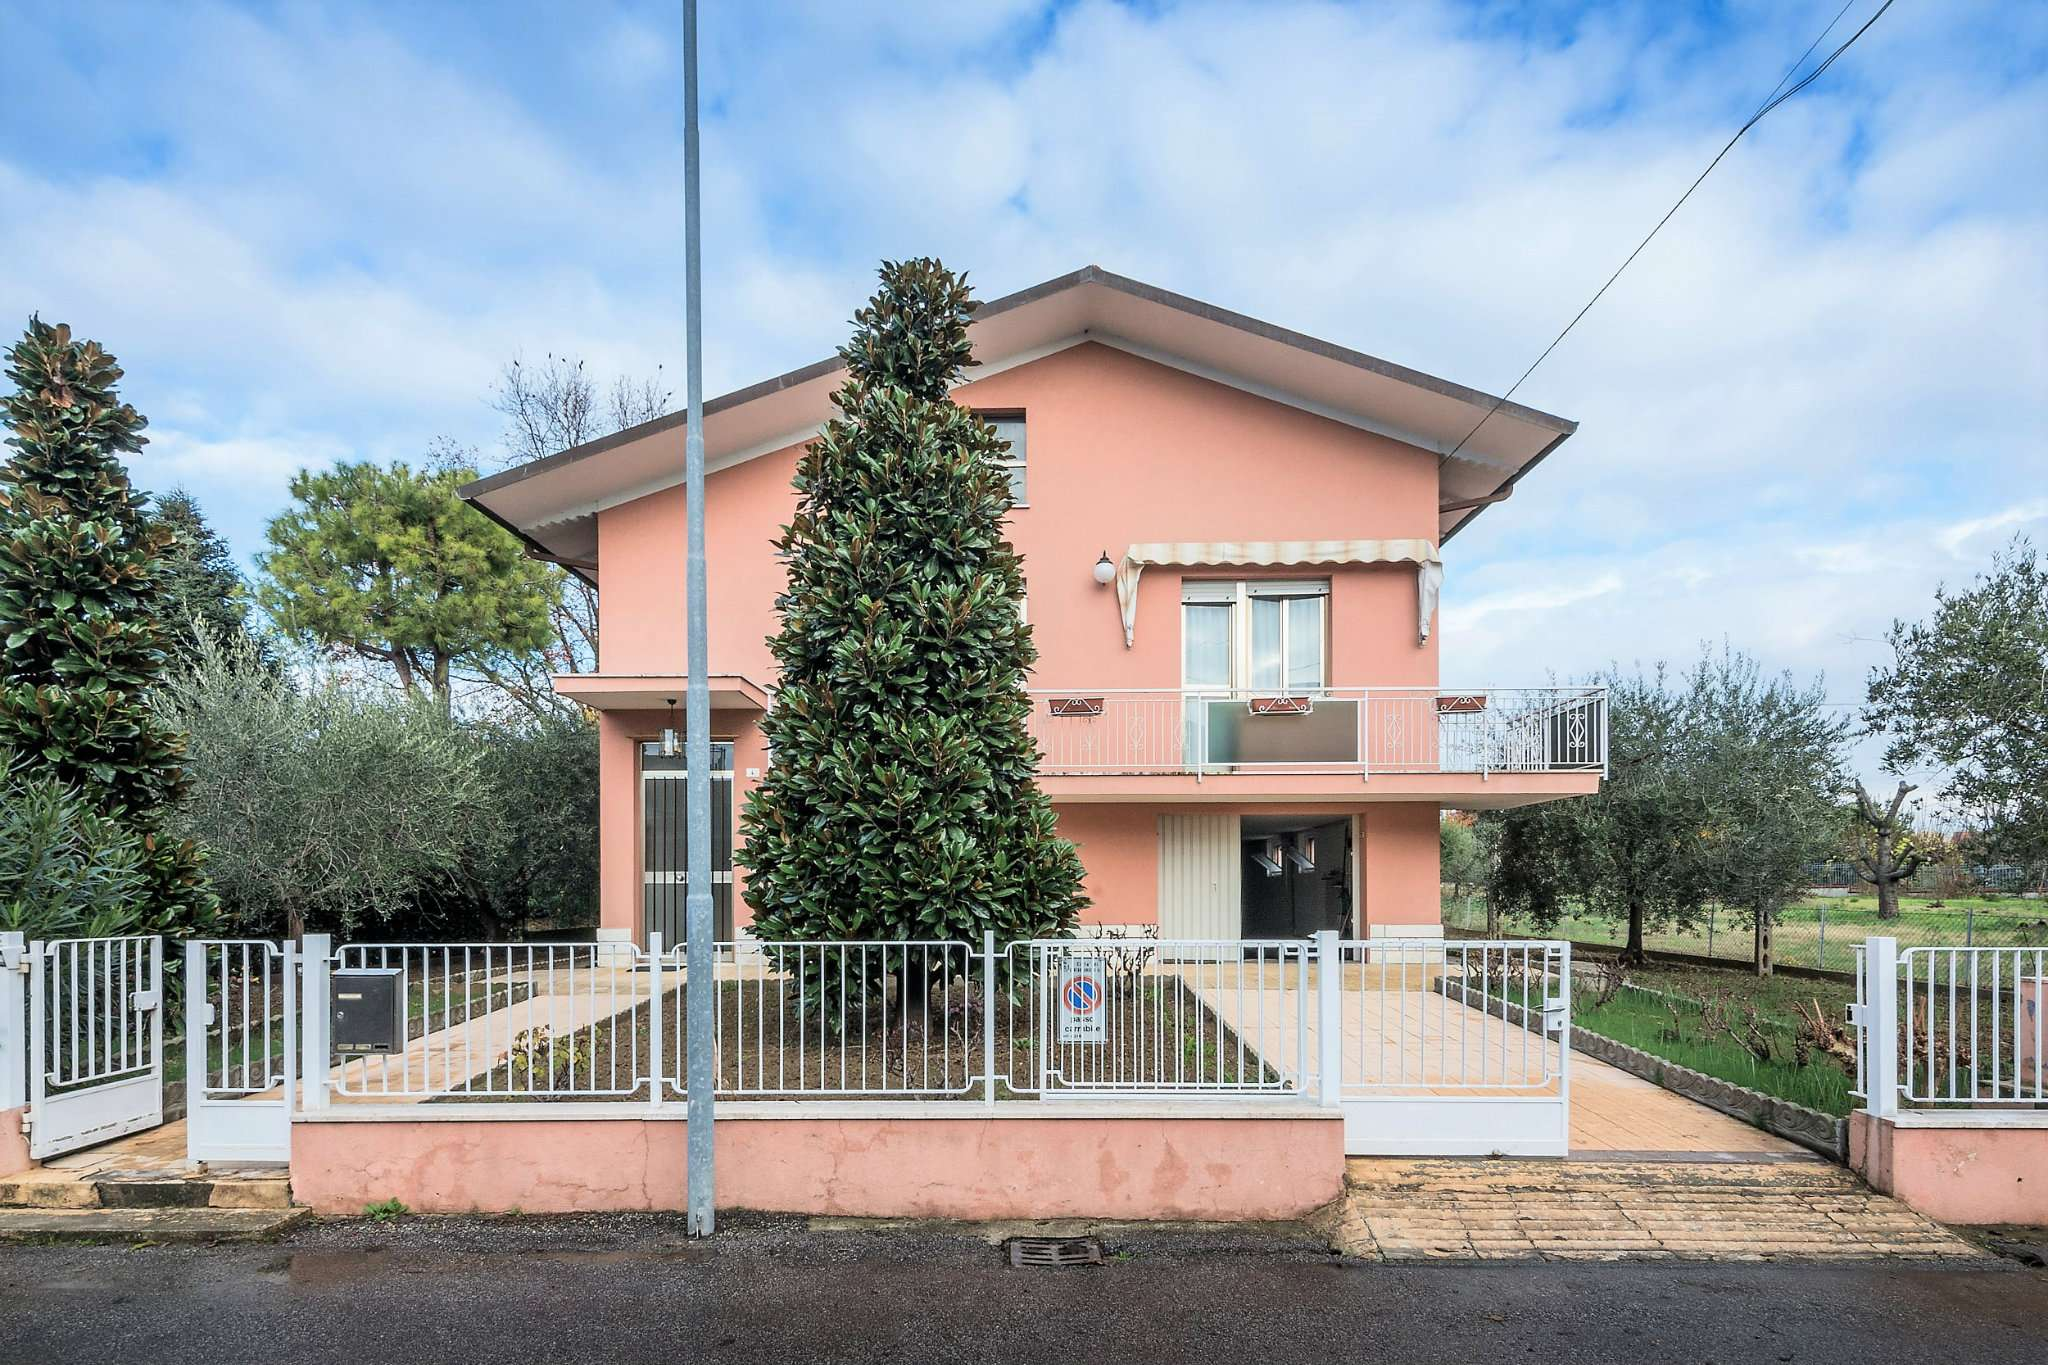 Soluzione Indipendente in Vendita a Santarcangelo di Romagna